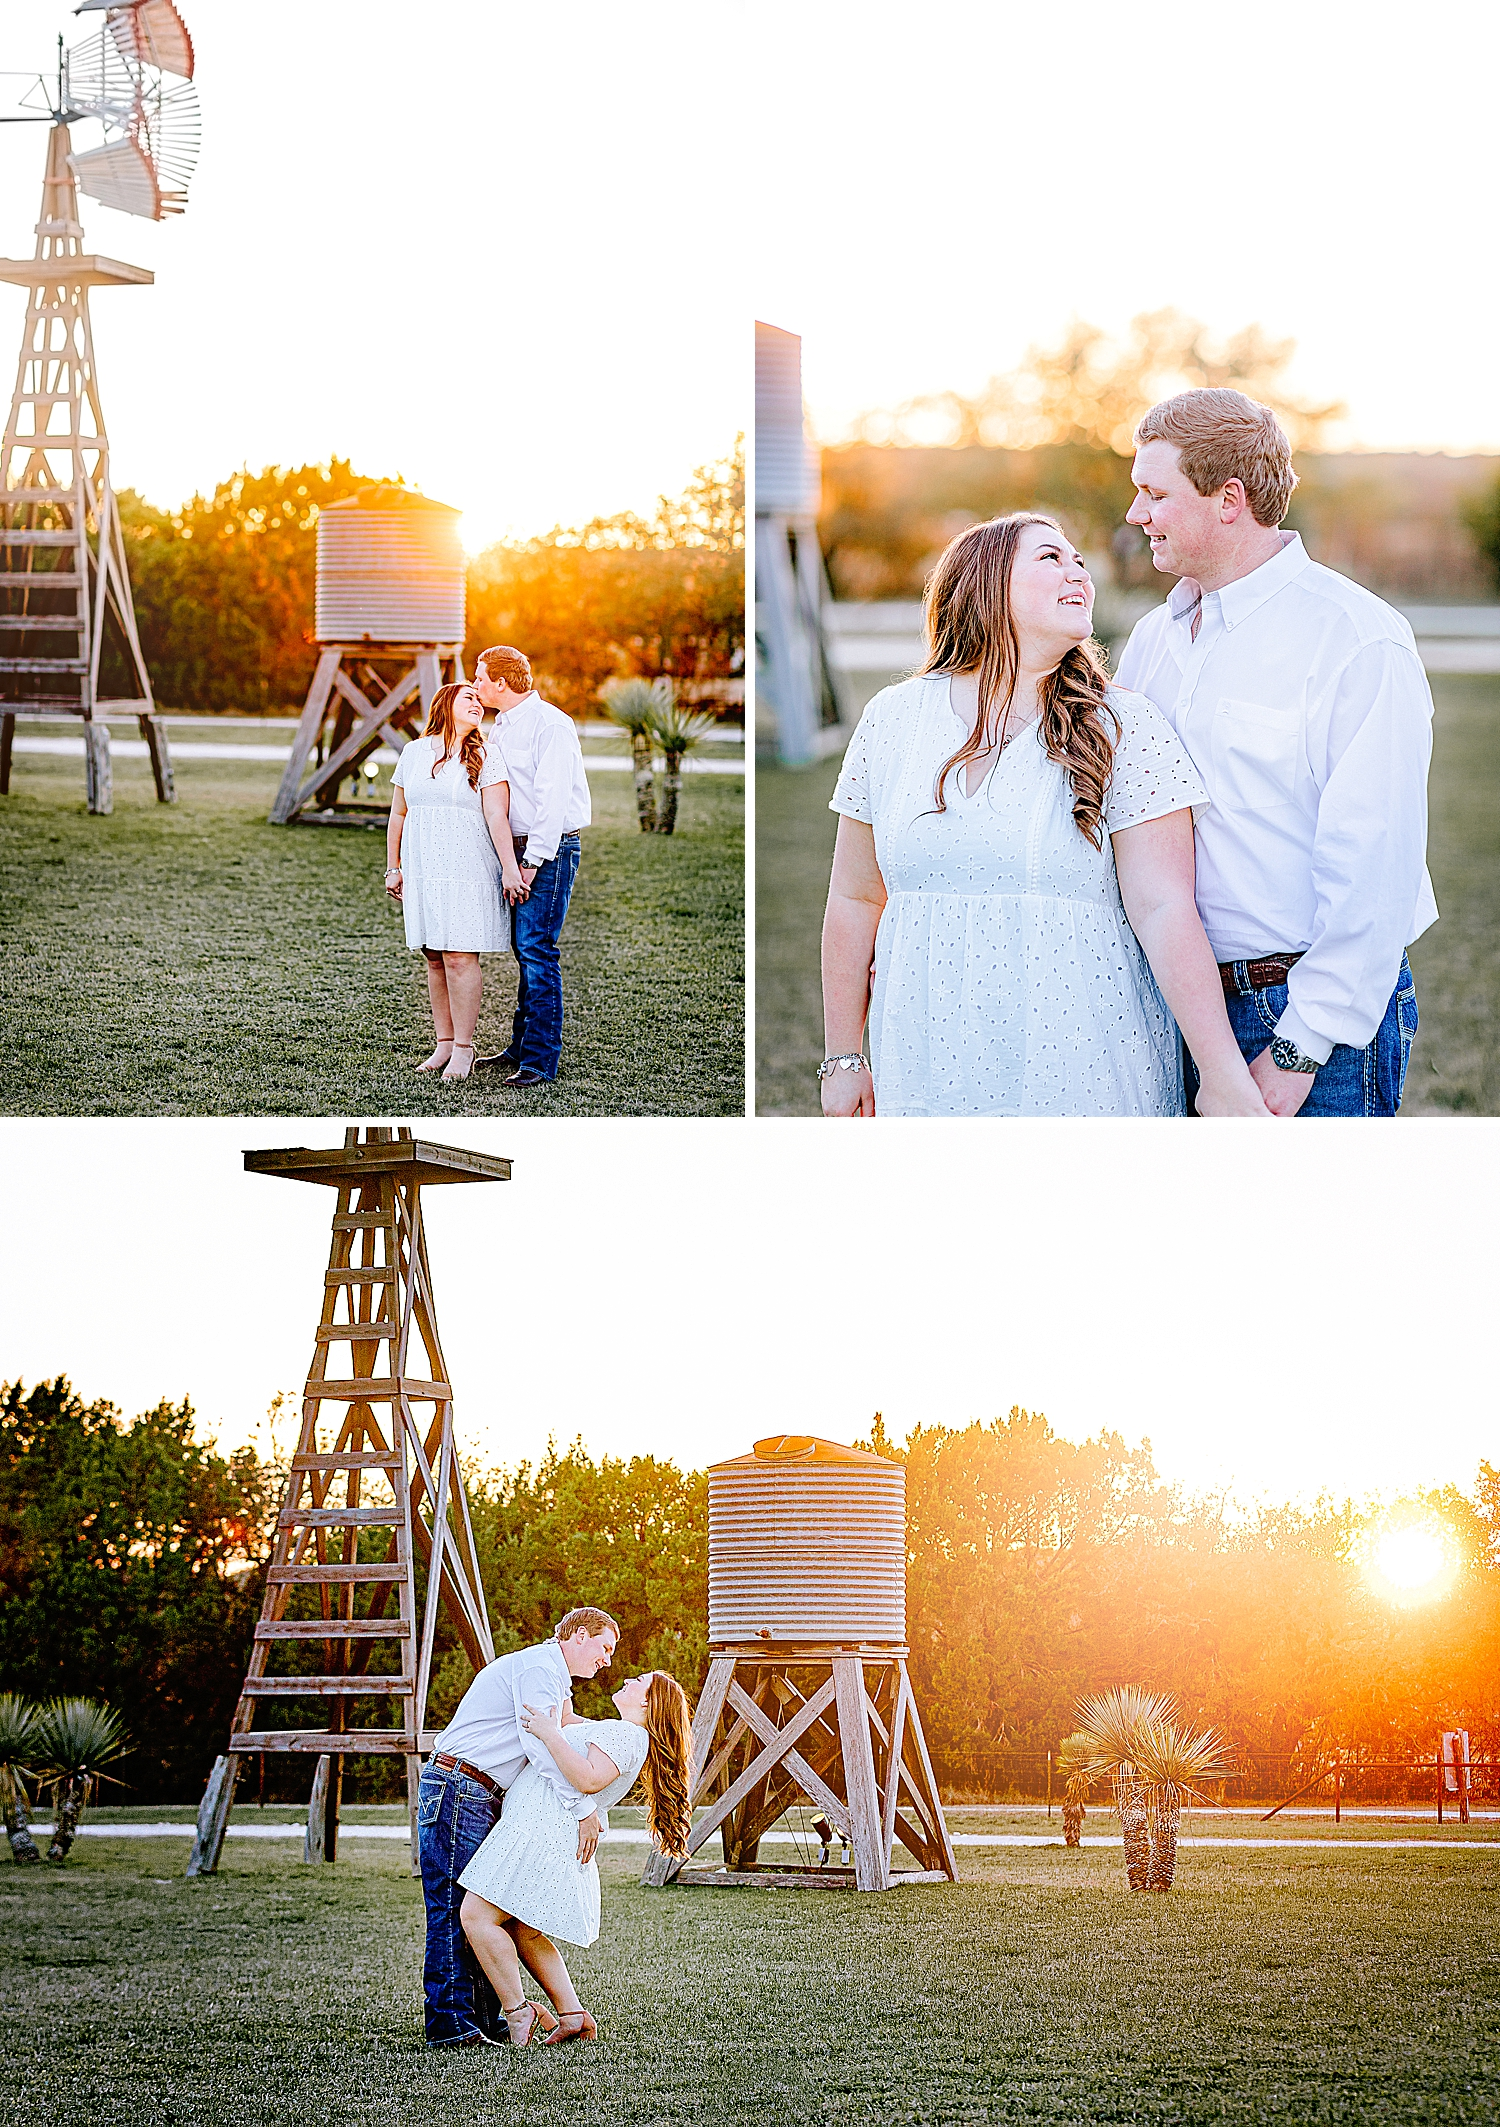 Engagement-photo-session-Western-Sky-wedding-venue-bulverde-texas-carly-barton-photography_0002.jpg